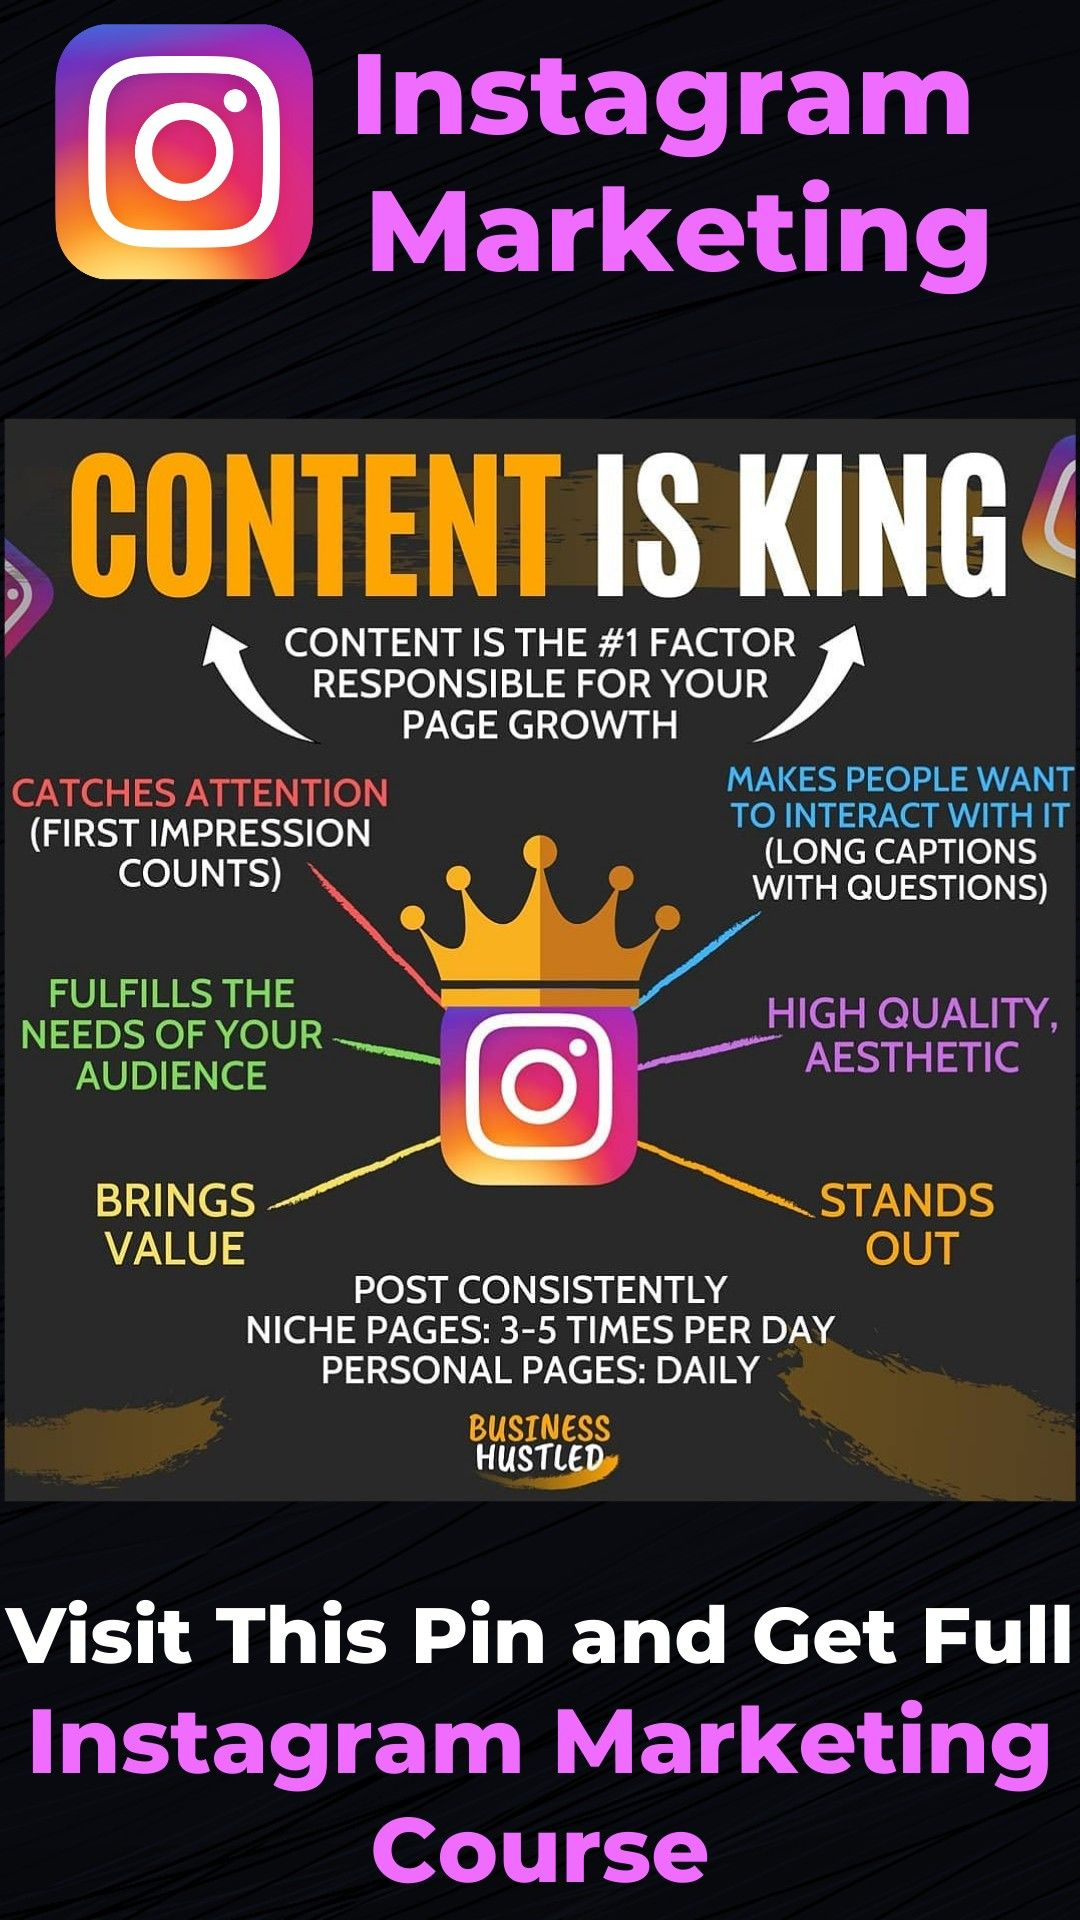 Content Instagram Marketing Social Media Marketing Digital Mar Social Media Marketing Instagram Social Media Marketing Business Instagram Marketing Strategy